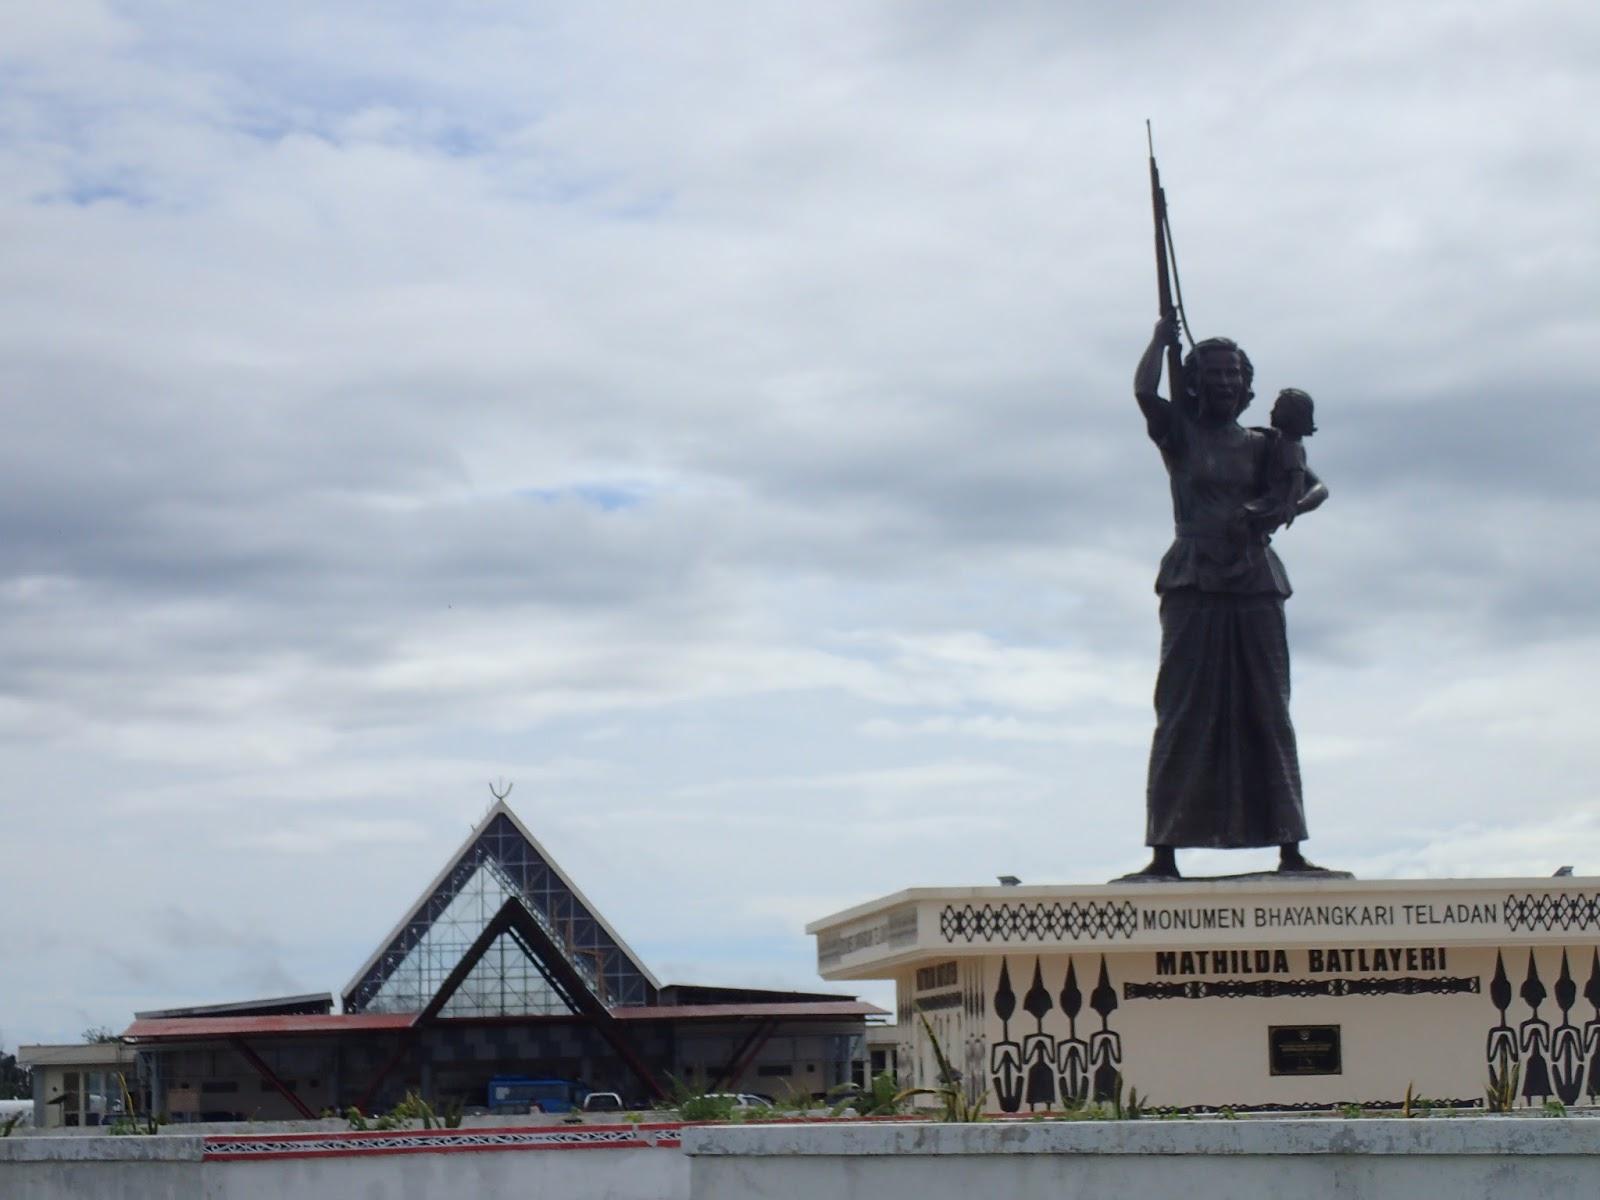 Patung Mathilda Batlayeri berdiri kokoh di depan bandara di Saumlaki (sumber : adheb.info)